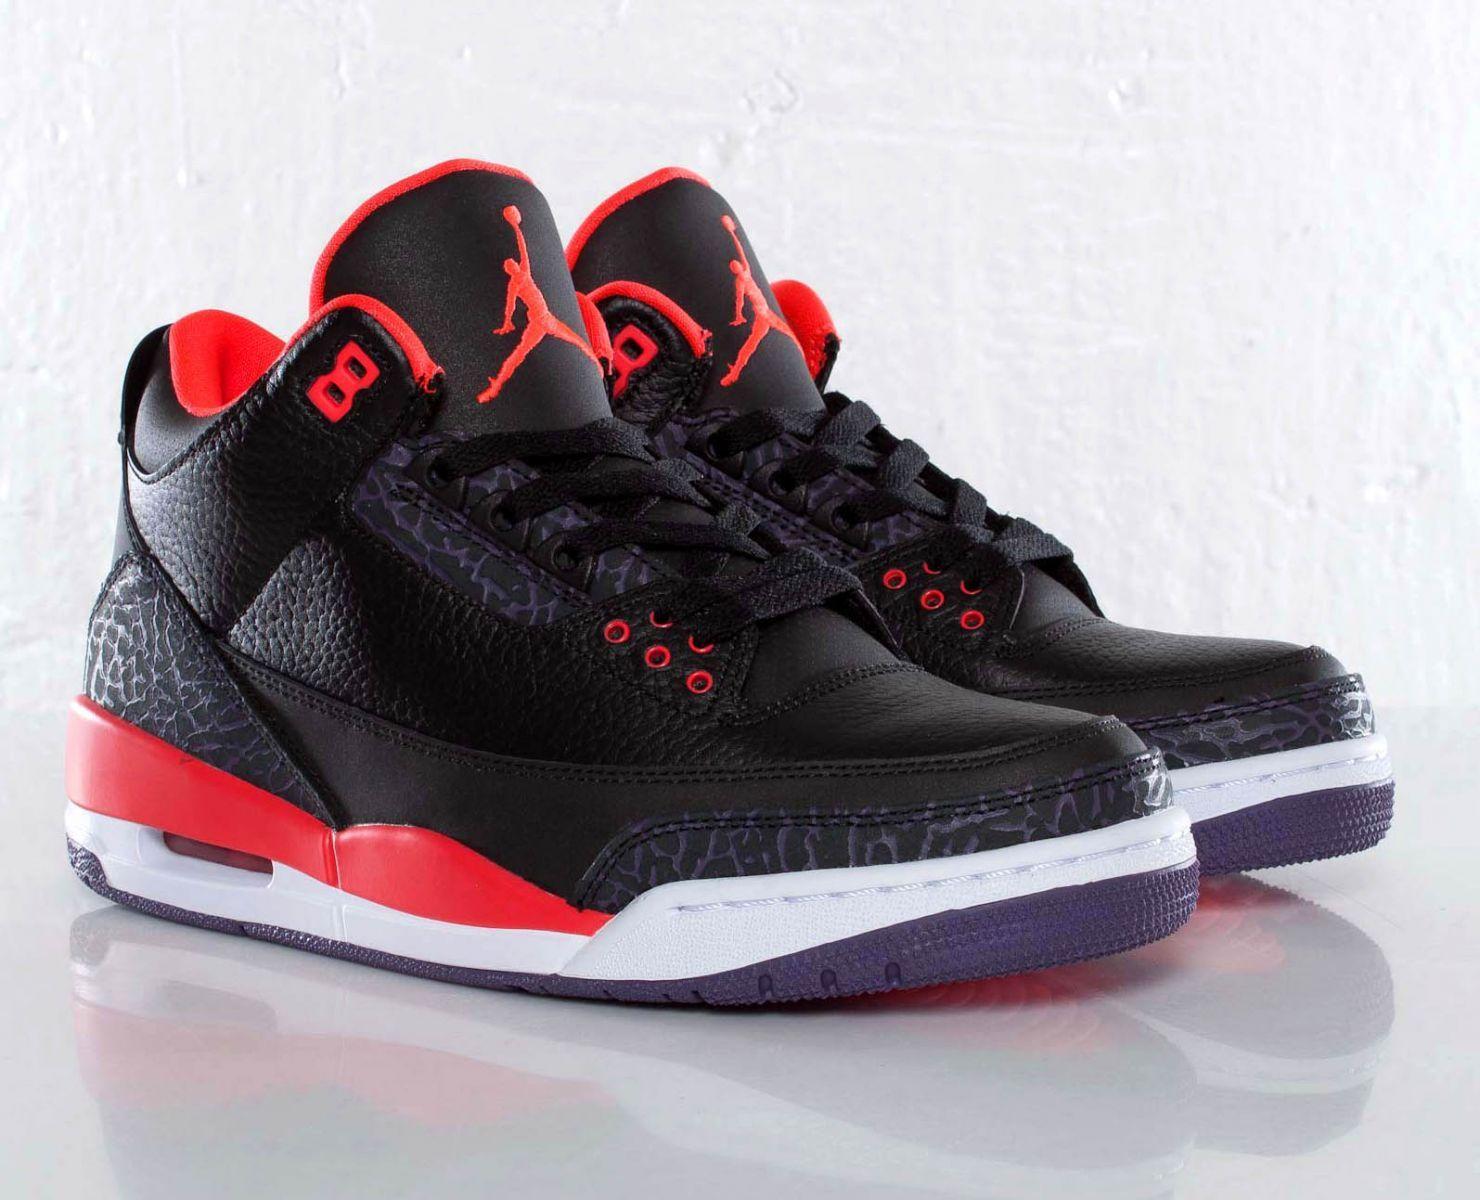 Air Jordan Retro 3 Damier Rouge Et Blanc